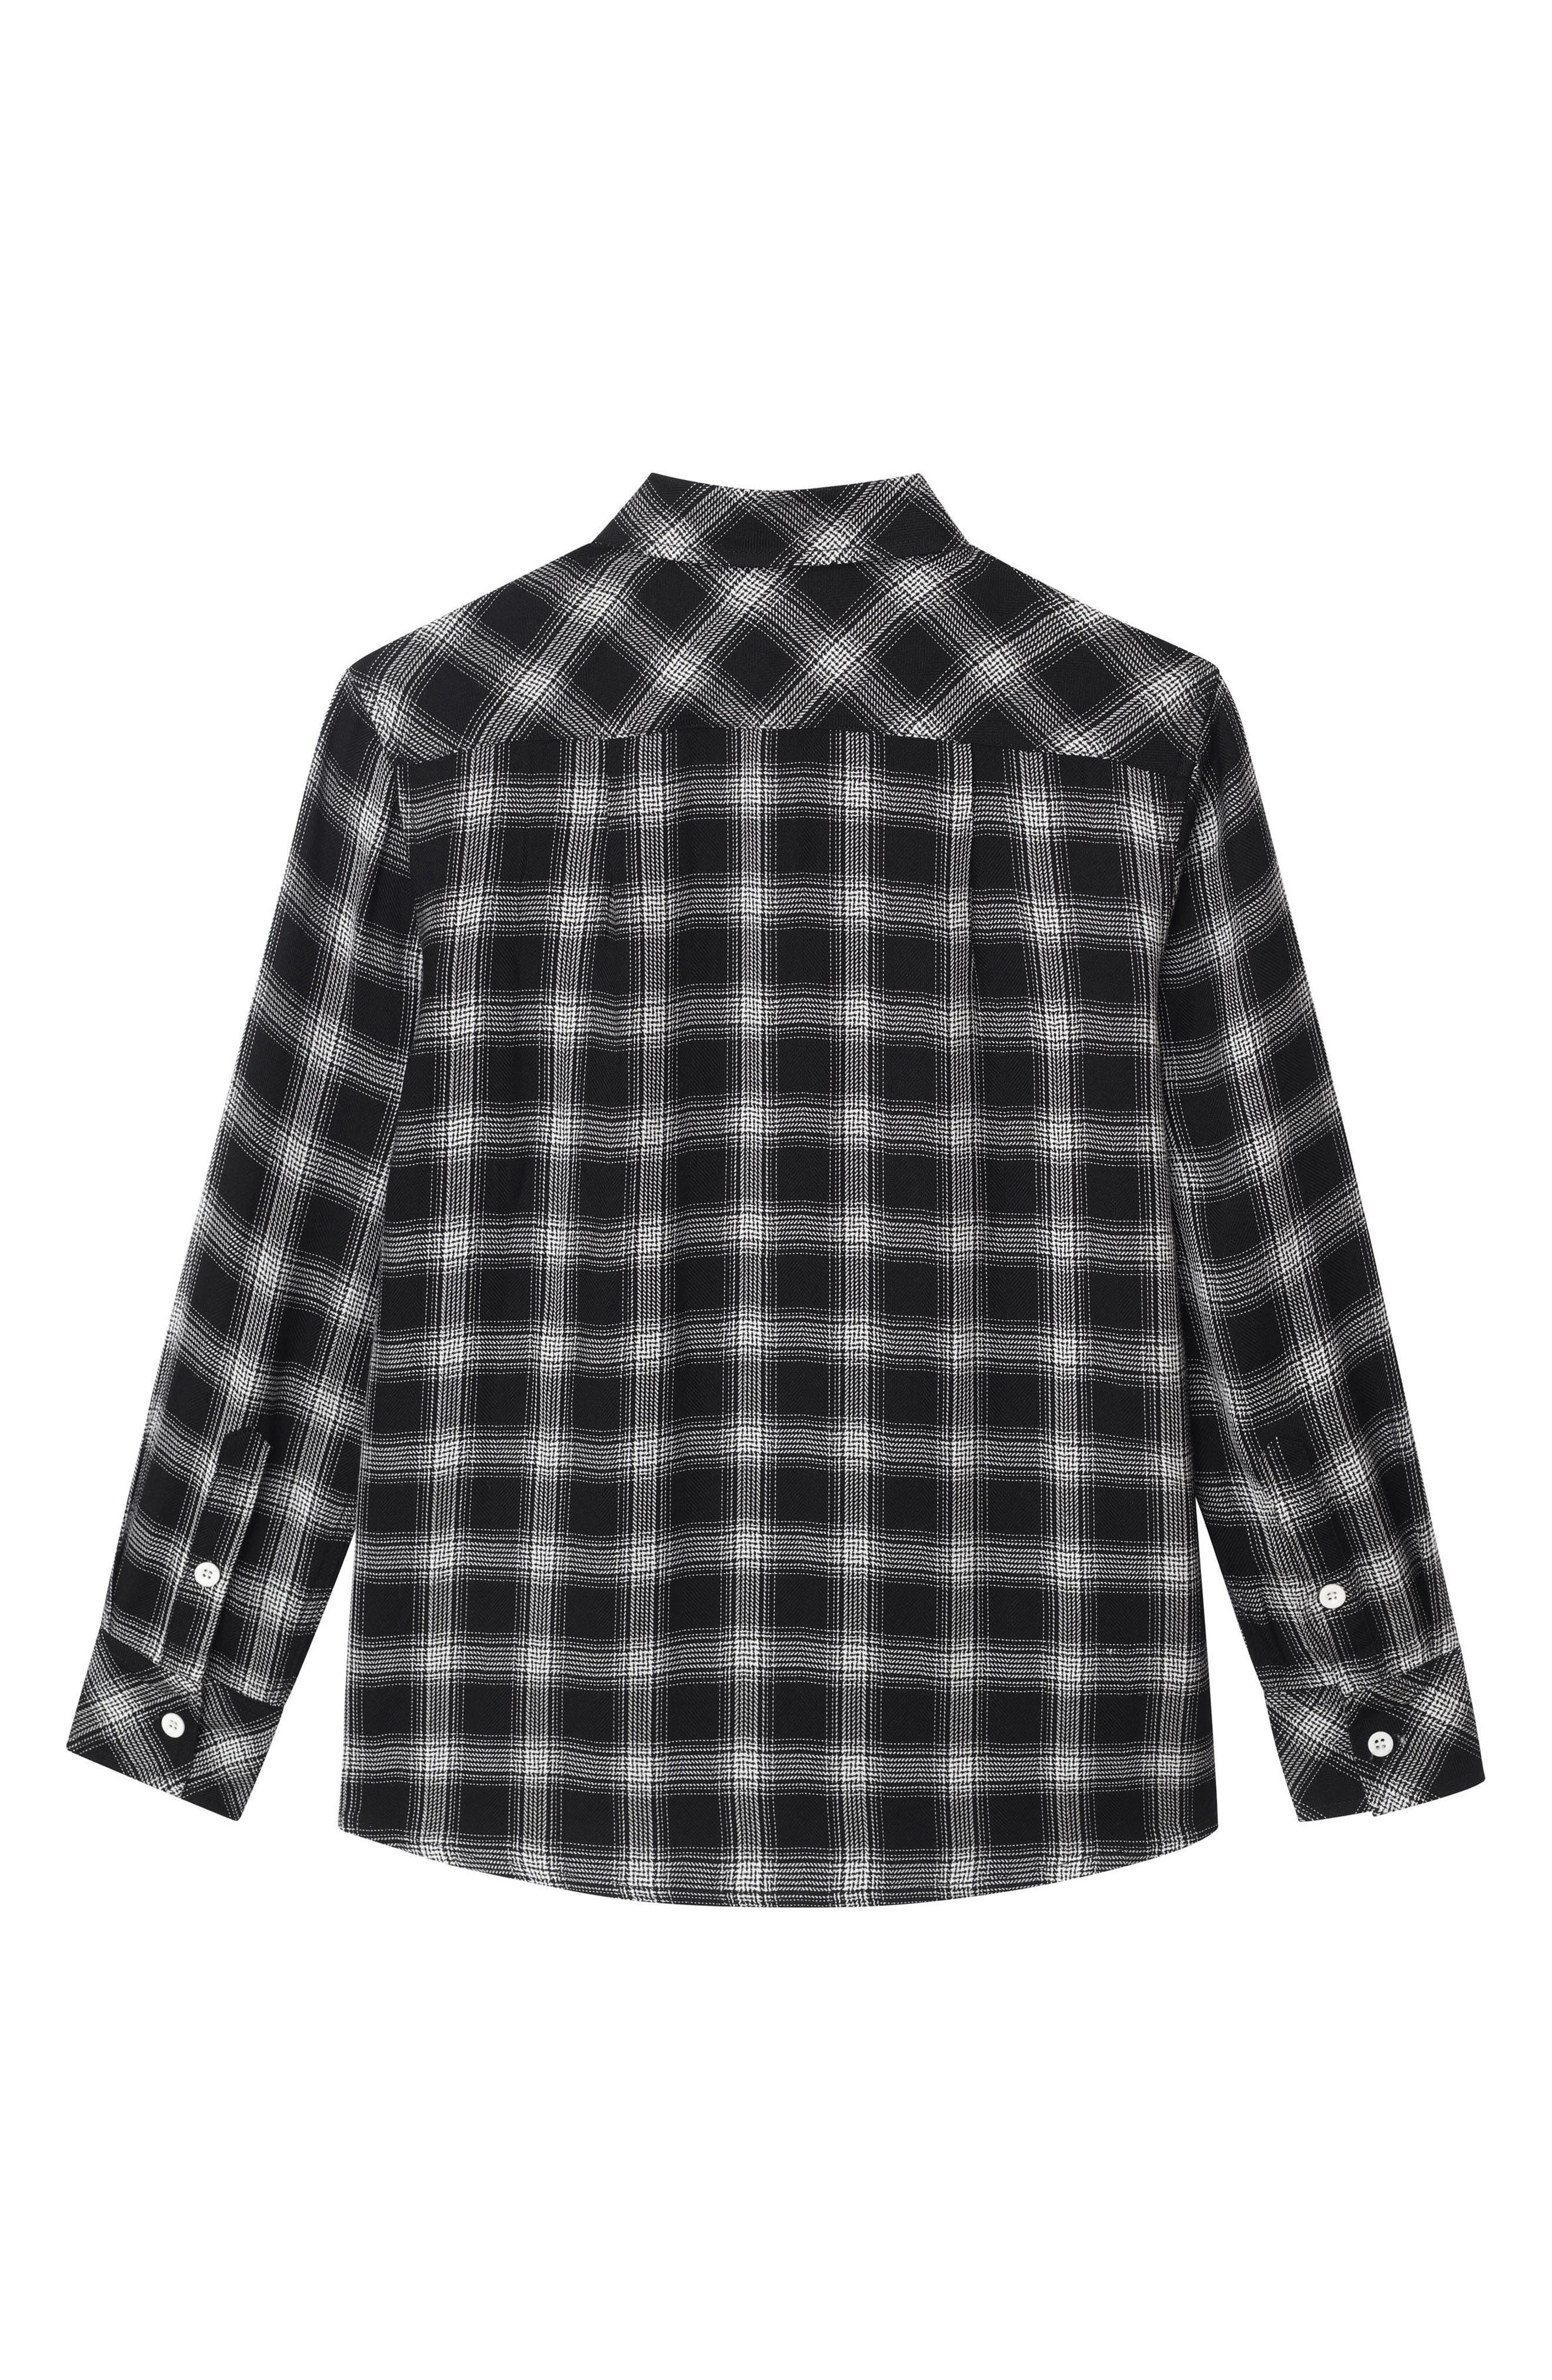 Ash Plaid Woven Shirt,                             Main thumbnail 1, color,                             BLACK PLAID